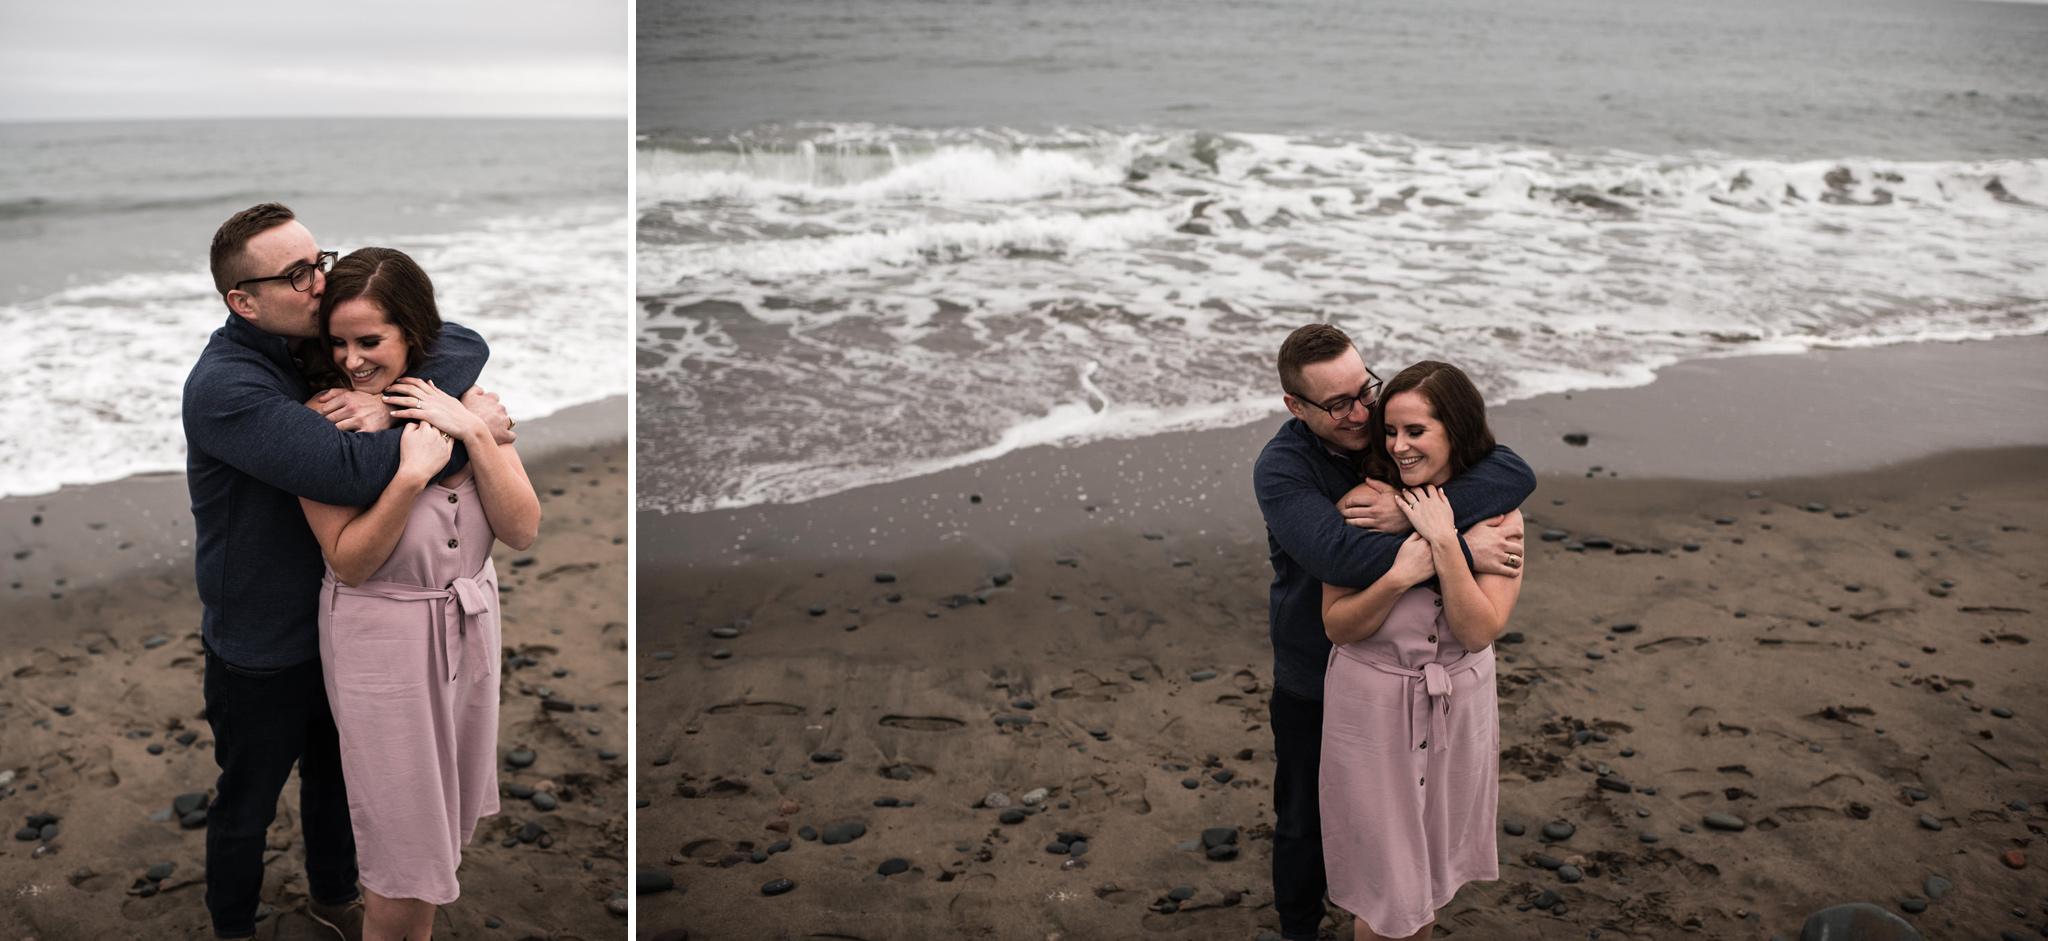 144-moody-lawrencetown-beach-nova-scotia-wedding-photographer-toronto.jpg